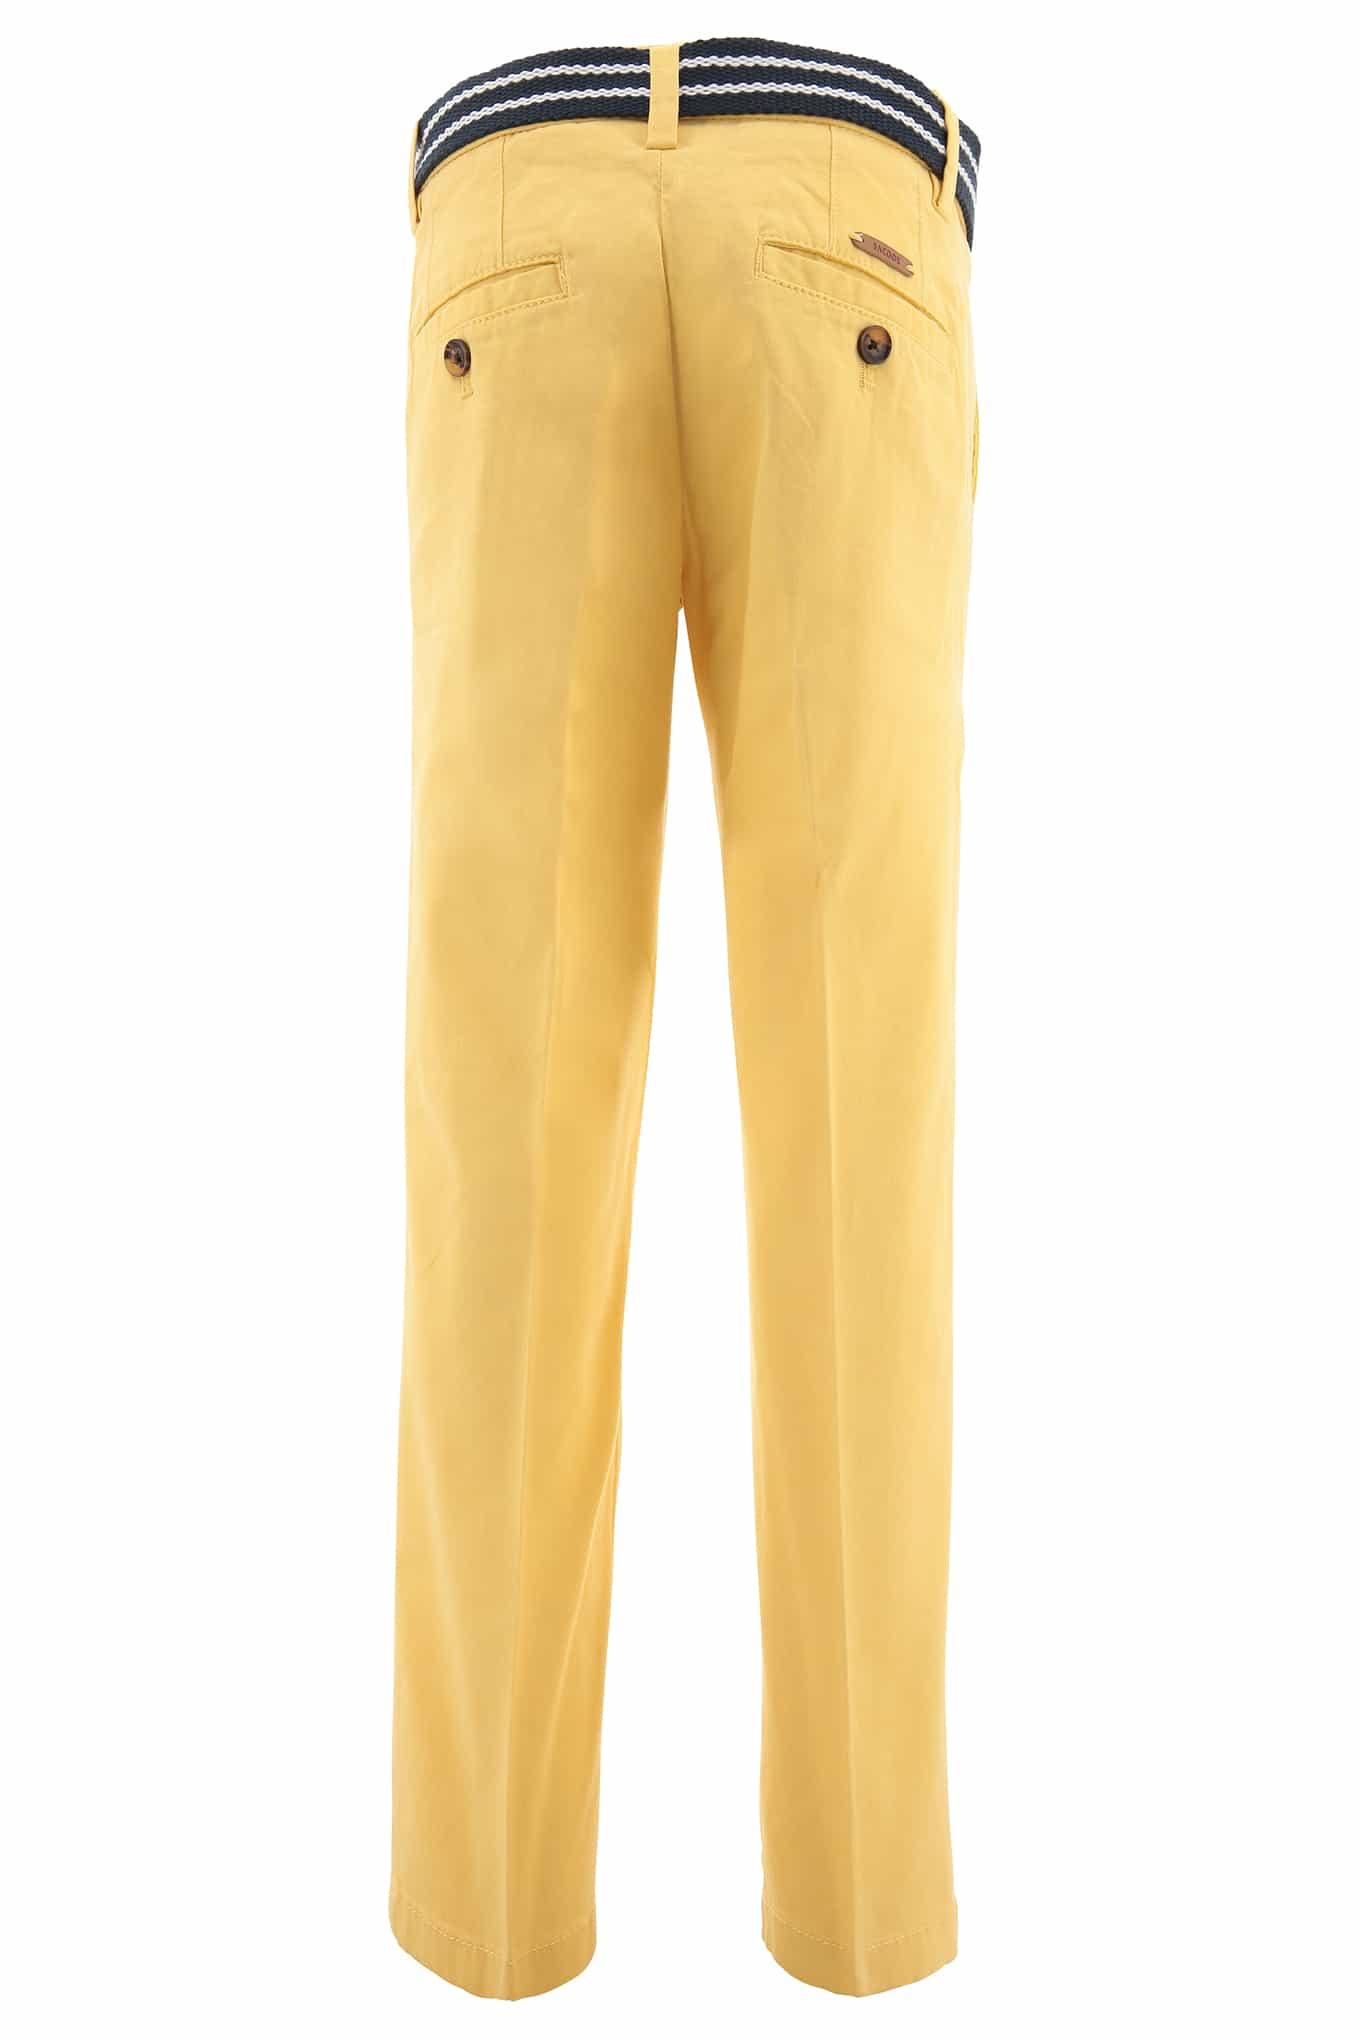 Chino Trousers Light Yellow Sport Boy